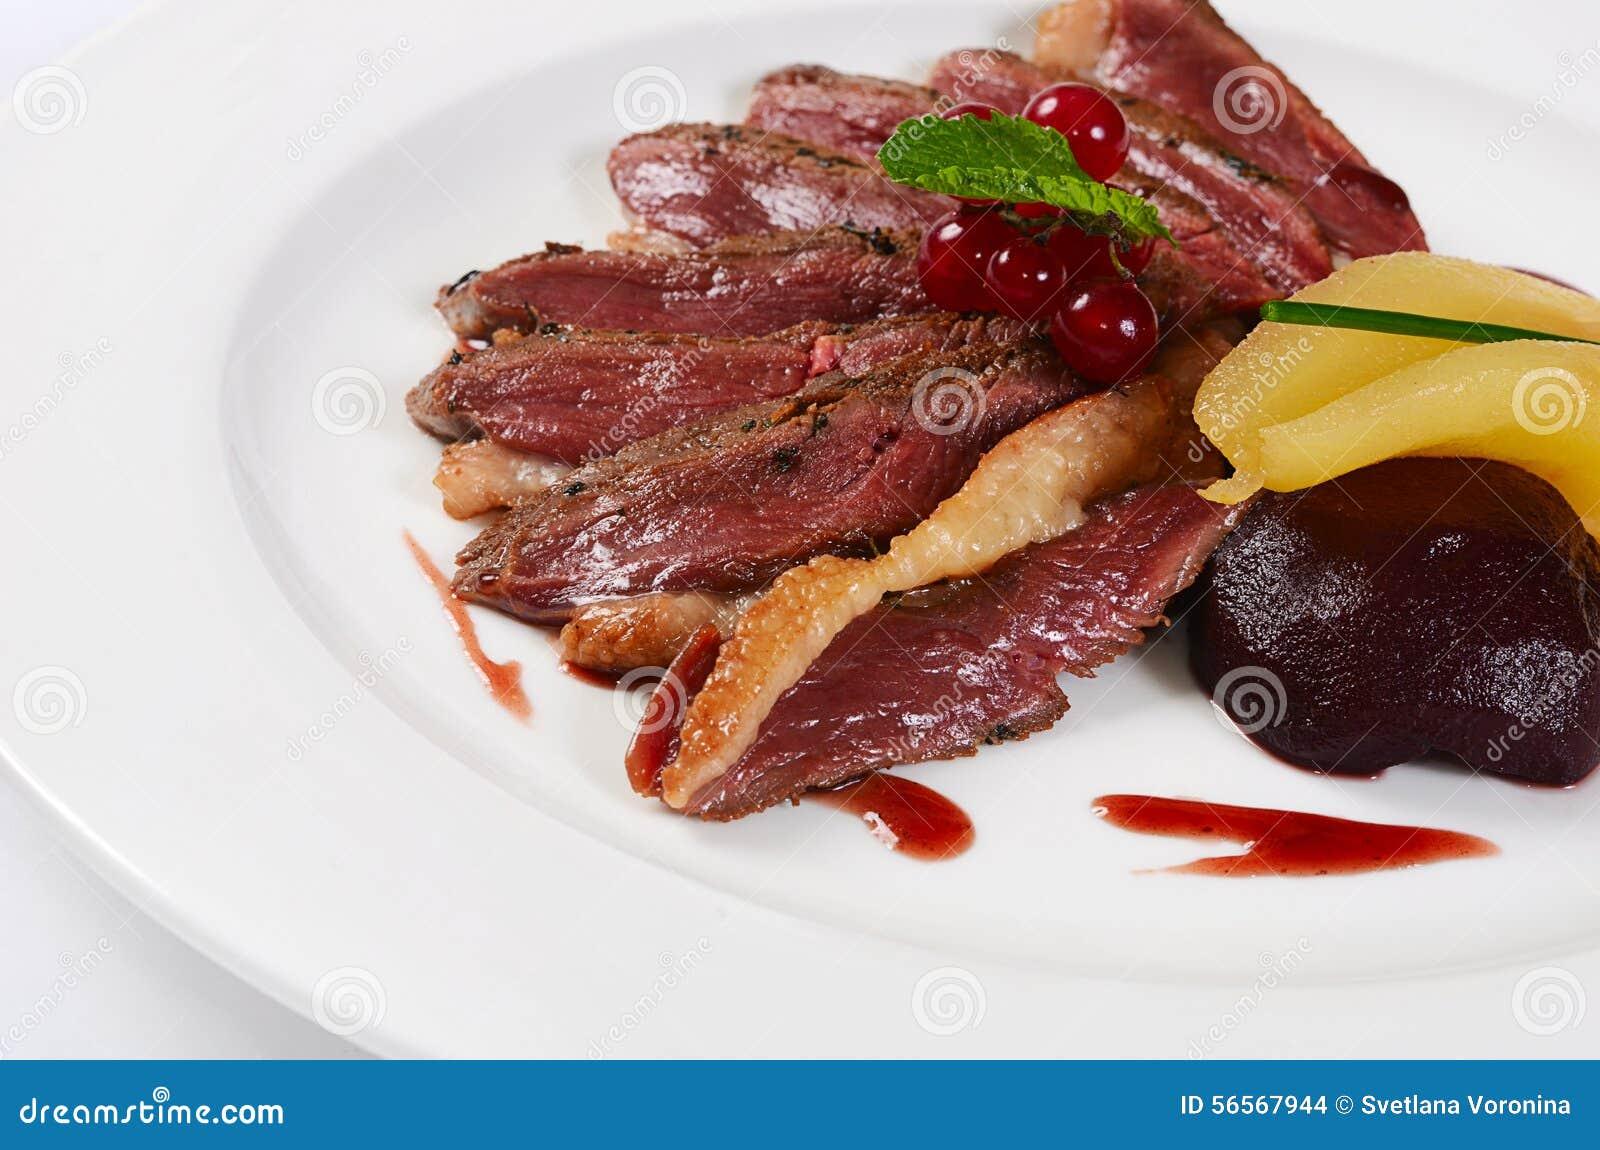 Download Στήθος παπιών στη σάλτσα κρασιού Στοκ Εικόνες - εικόνα από πετρέλαιο, grilled: 56567944